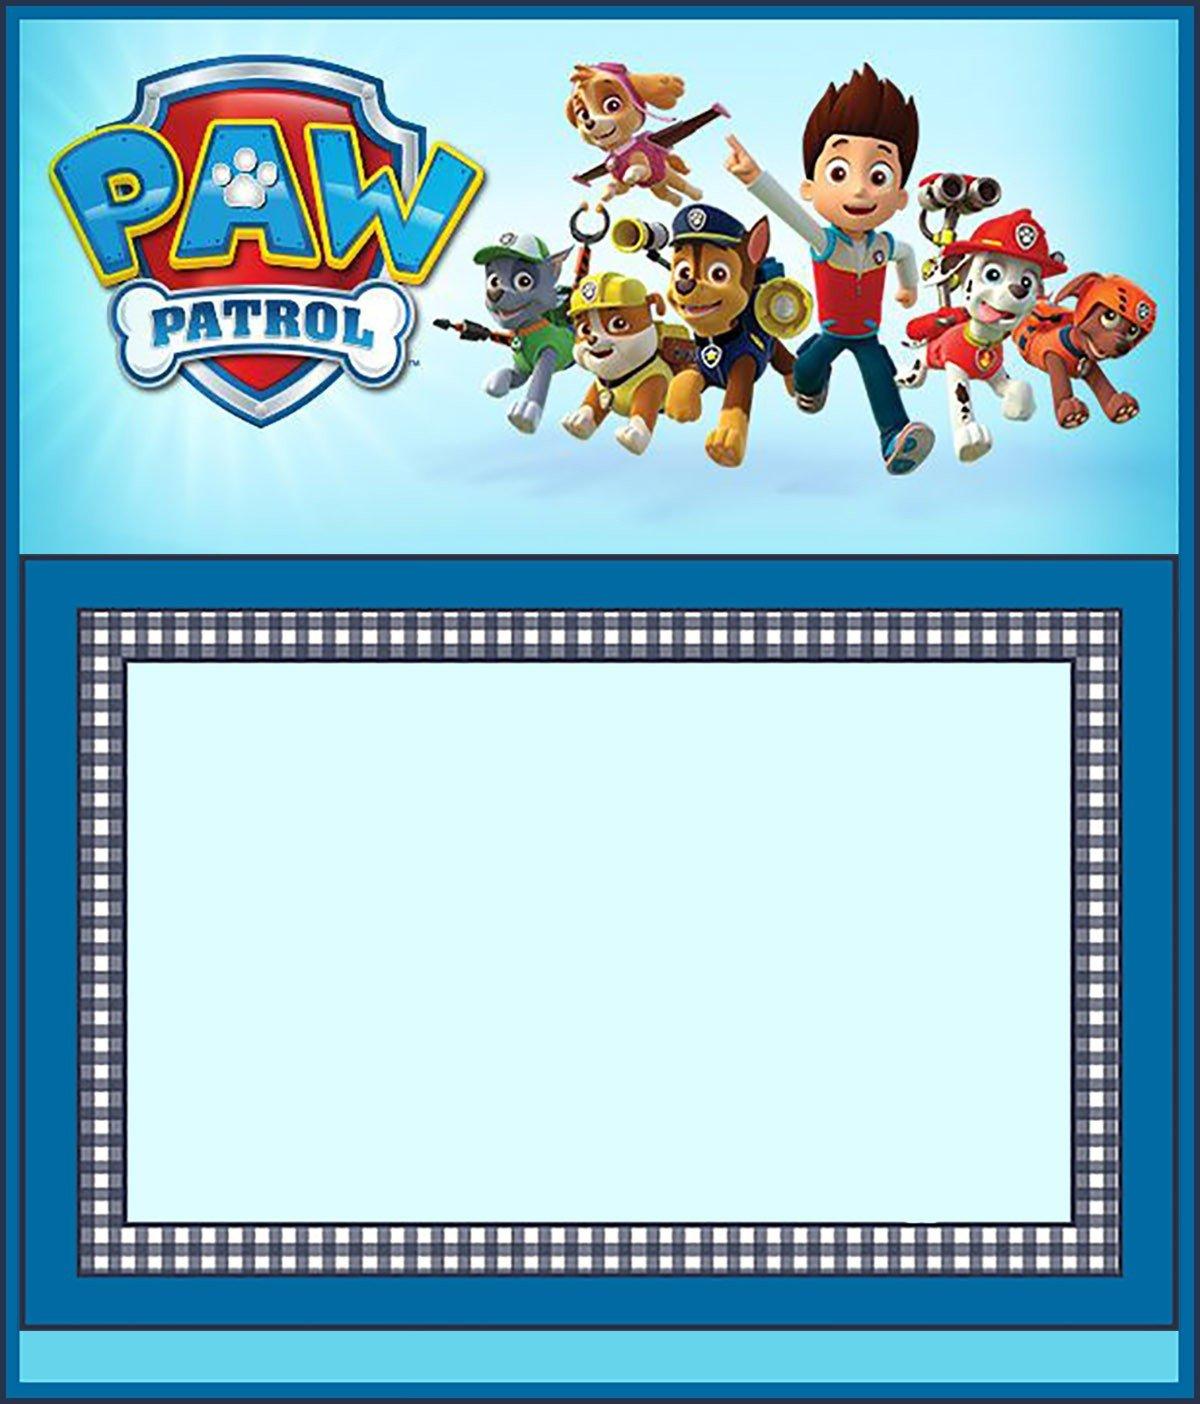 Paw Patrol Invitation Templates Make Printable Paw Patrol Invitations Using Free Templates